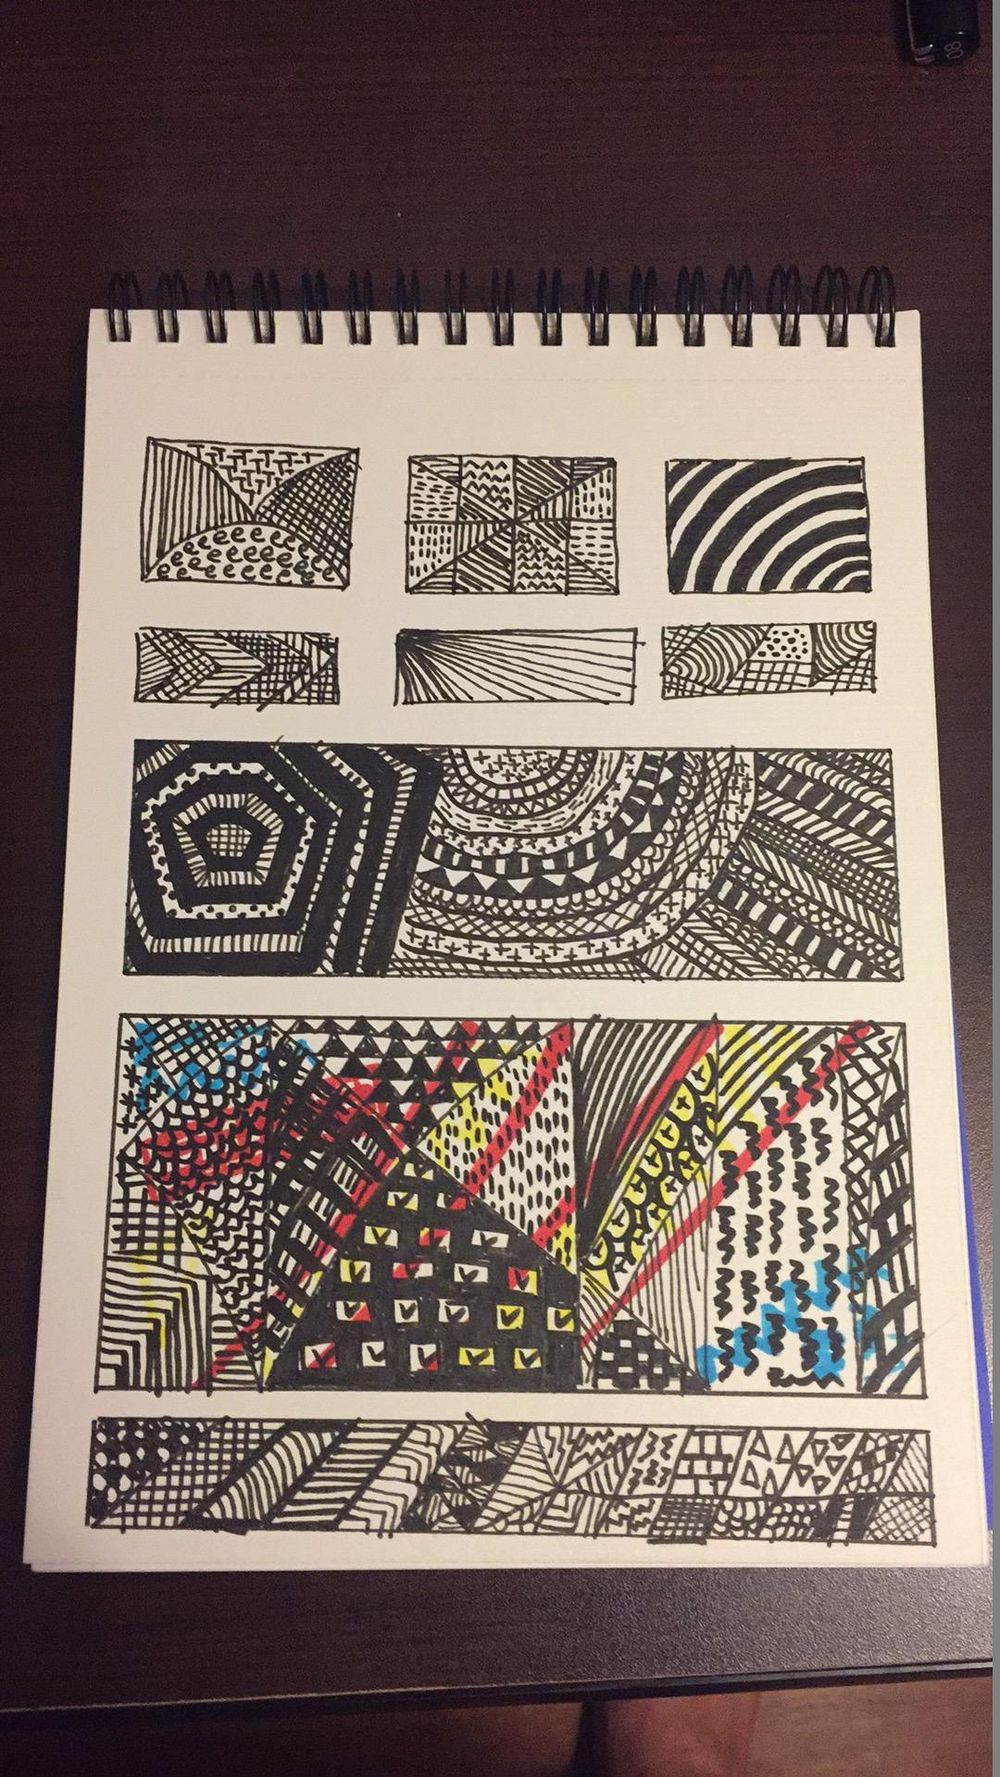 Vignettes - image 1 - student project